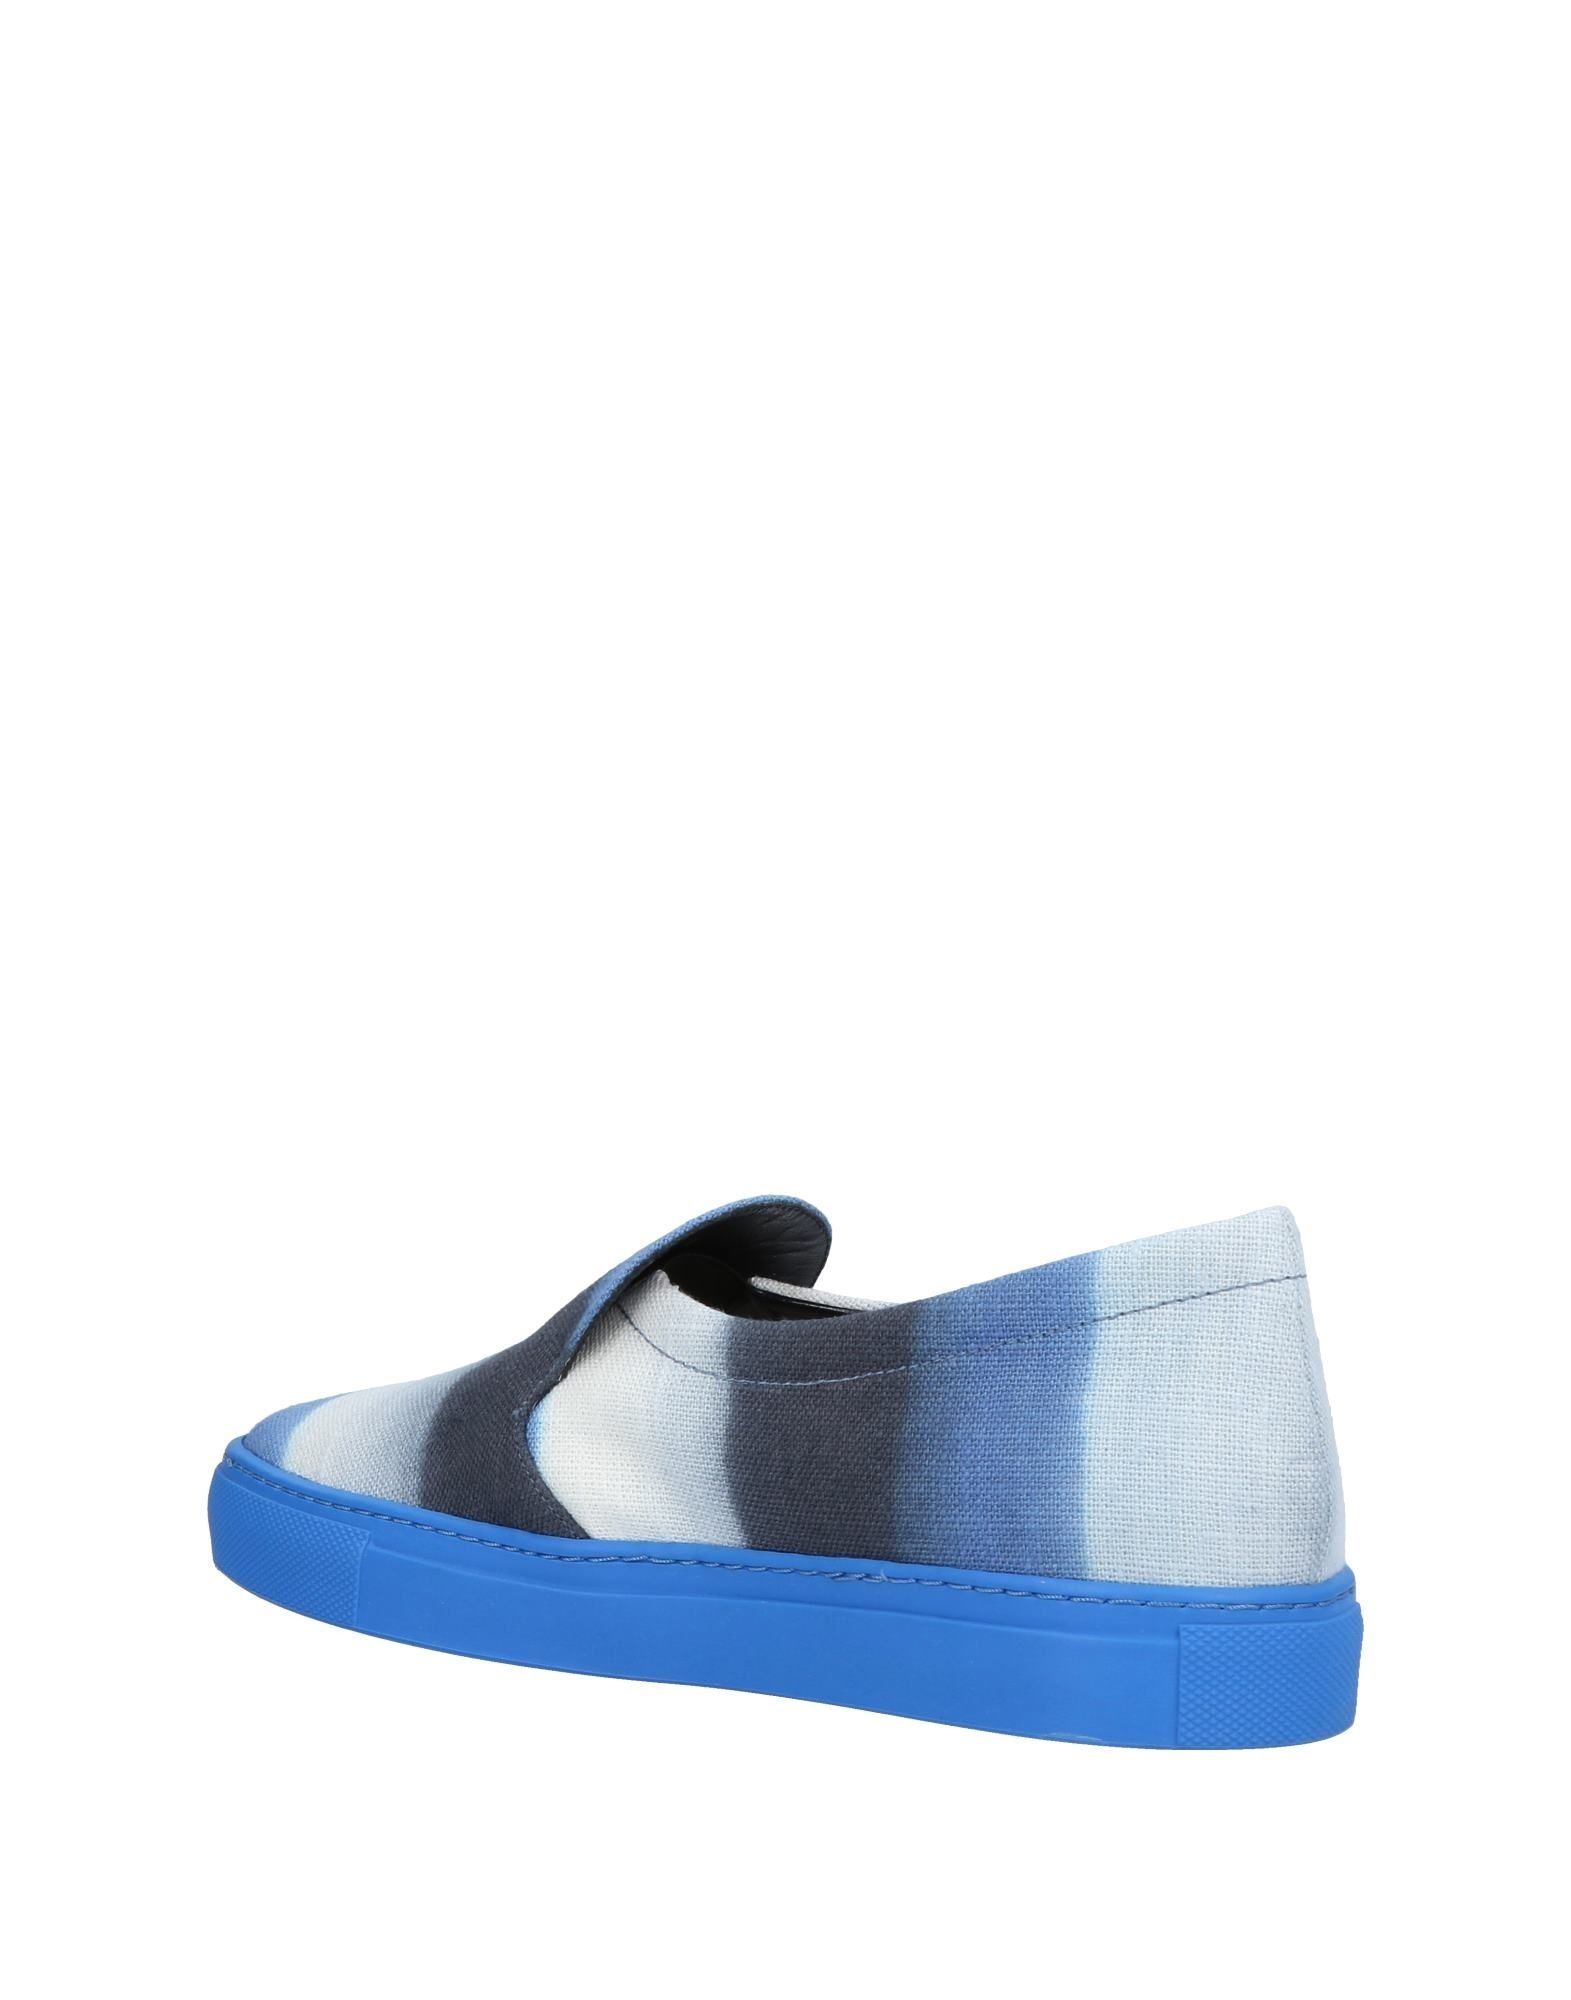 Stilvolle Damen billige Schuhe Rodo Sneakers Damen Stilvolle  11465907AP 6d869b